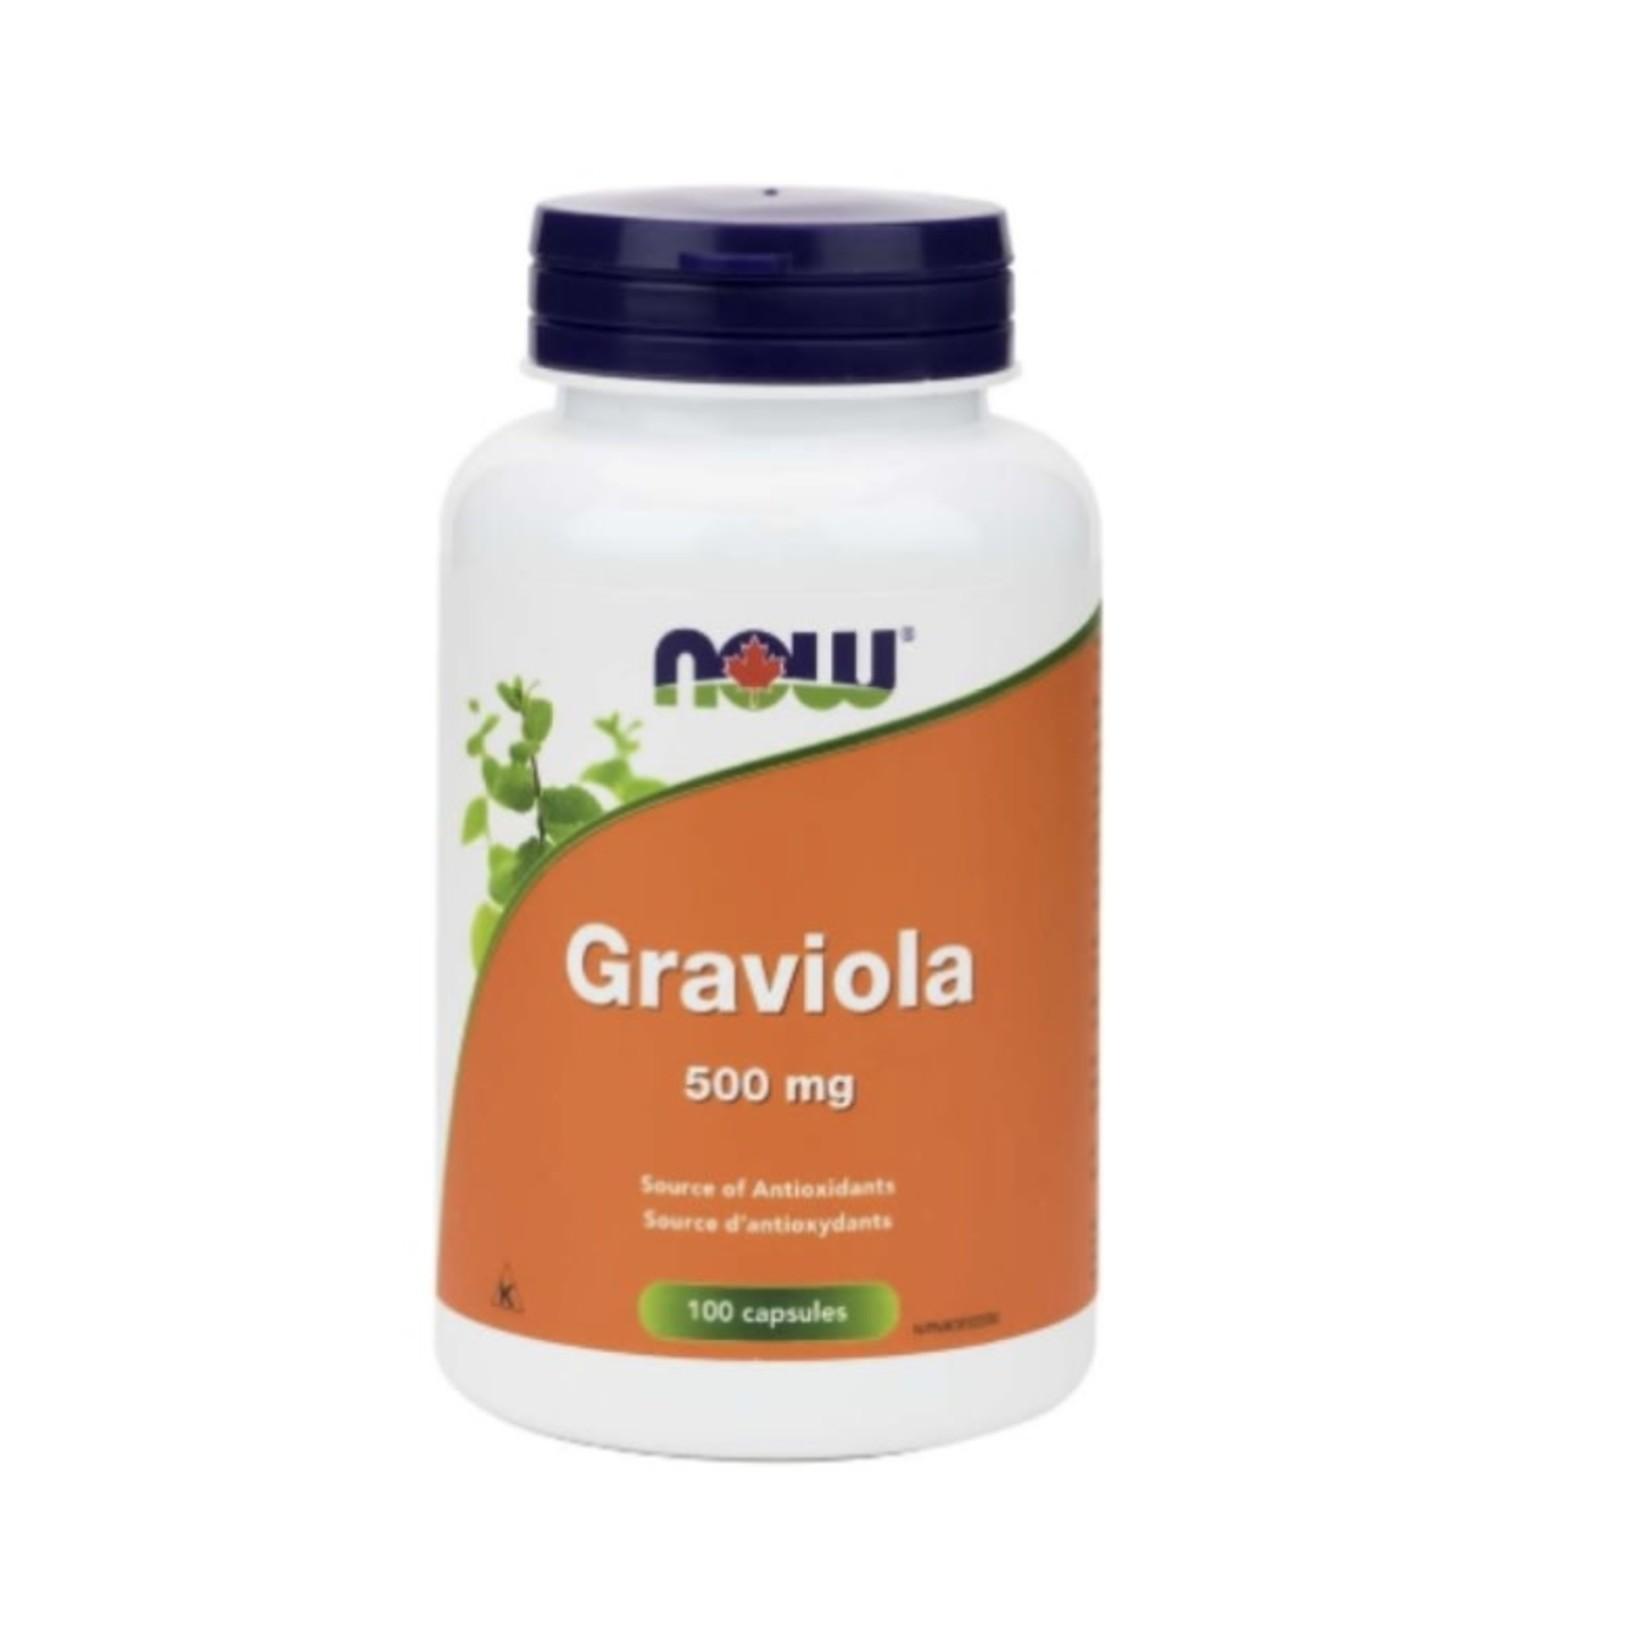 Now Now Graviola 500mg 100 caps